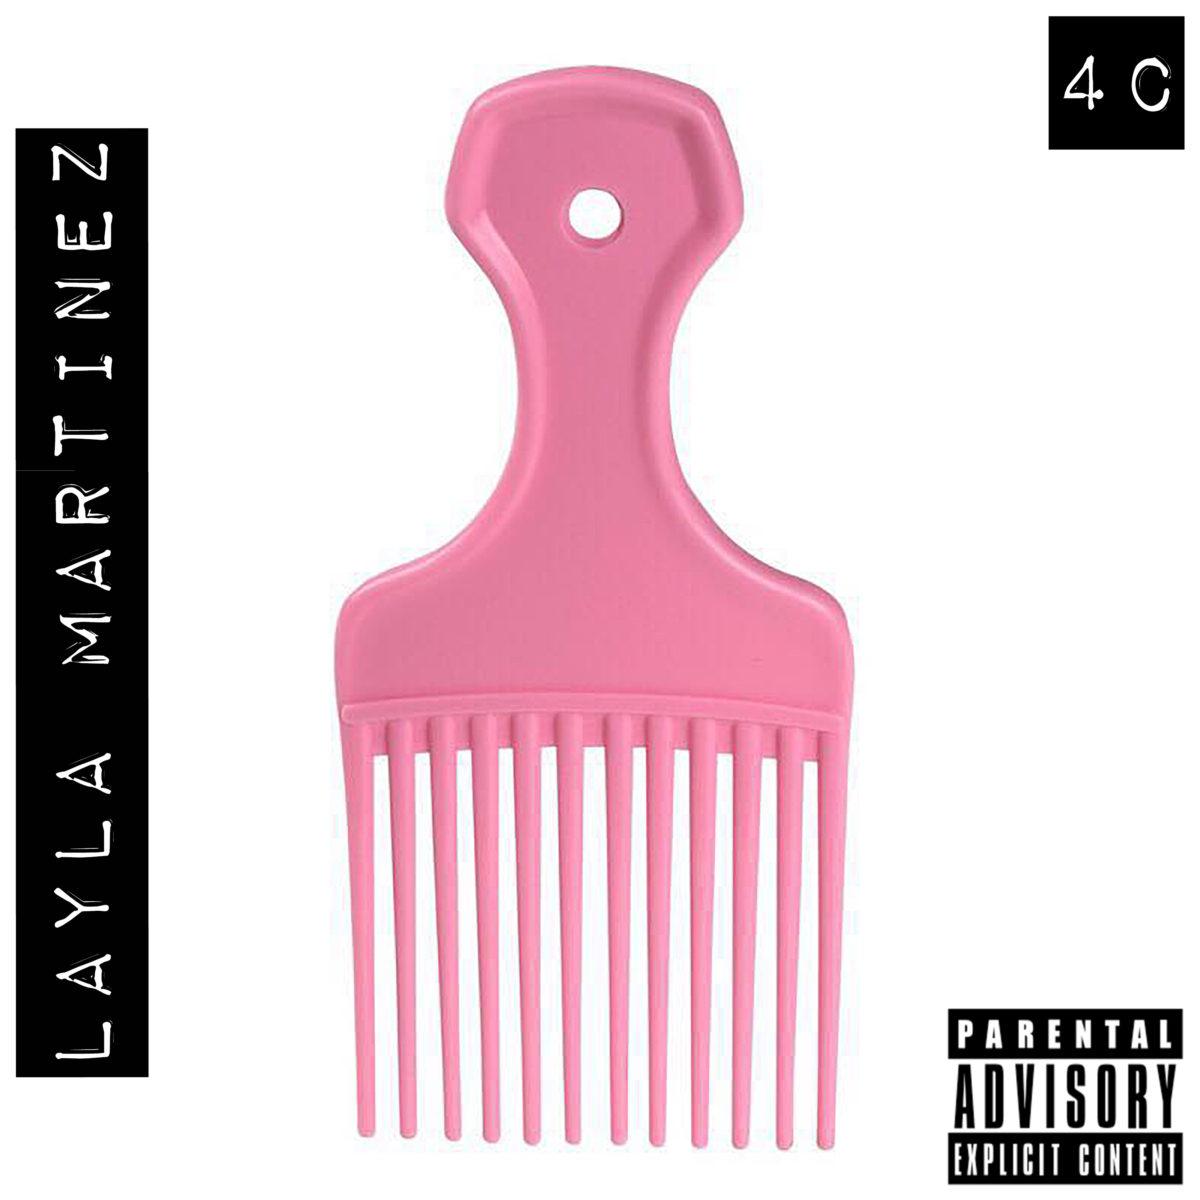 layla-martinez-4c